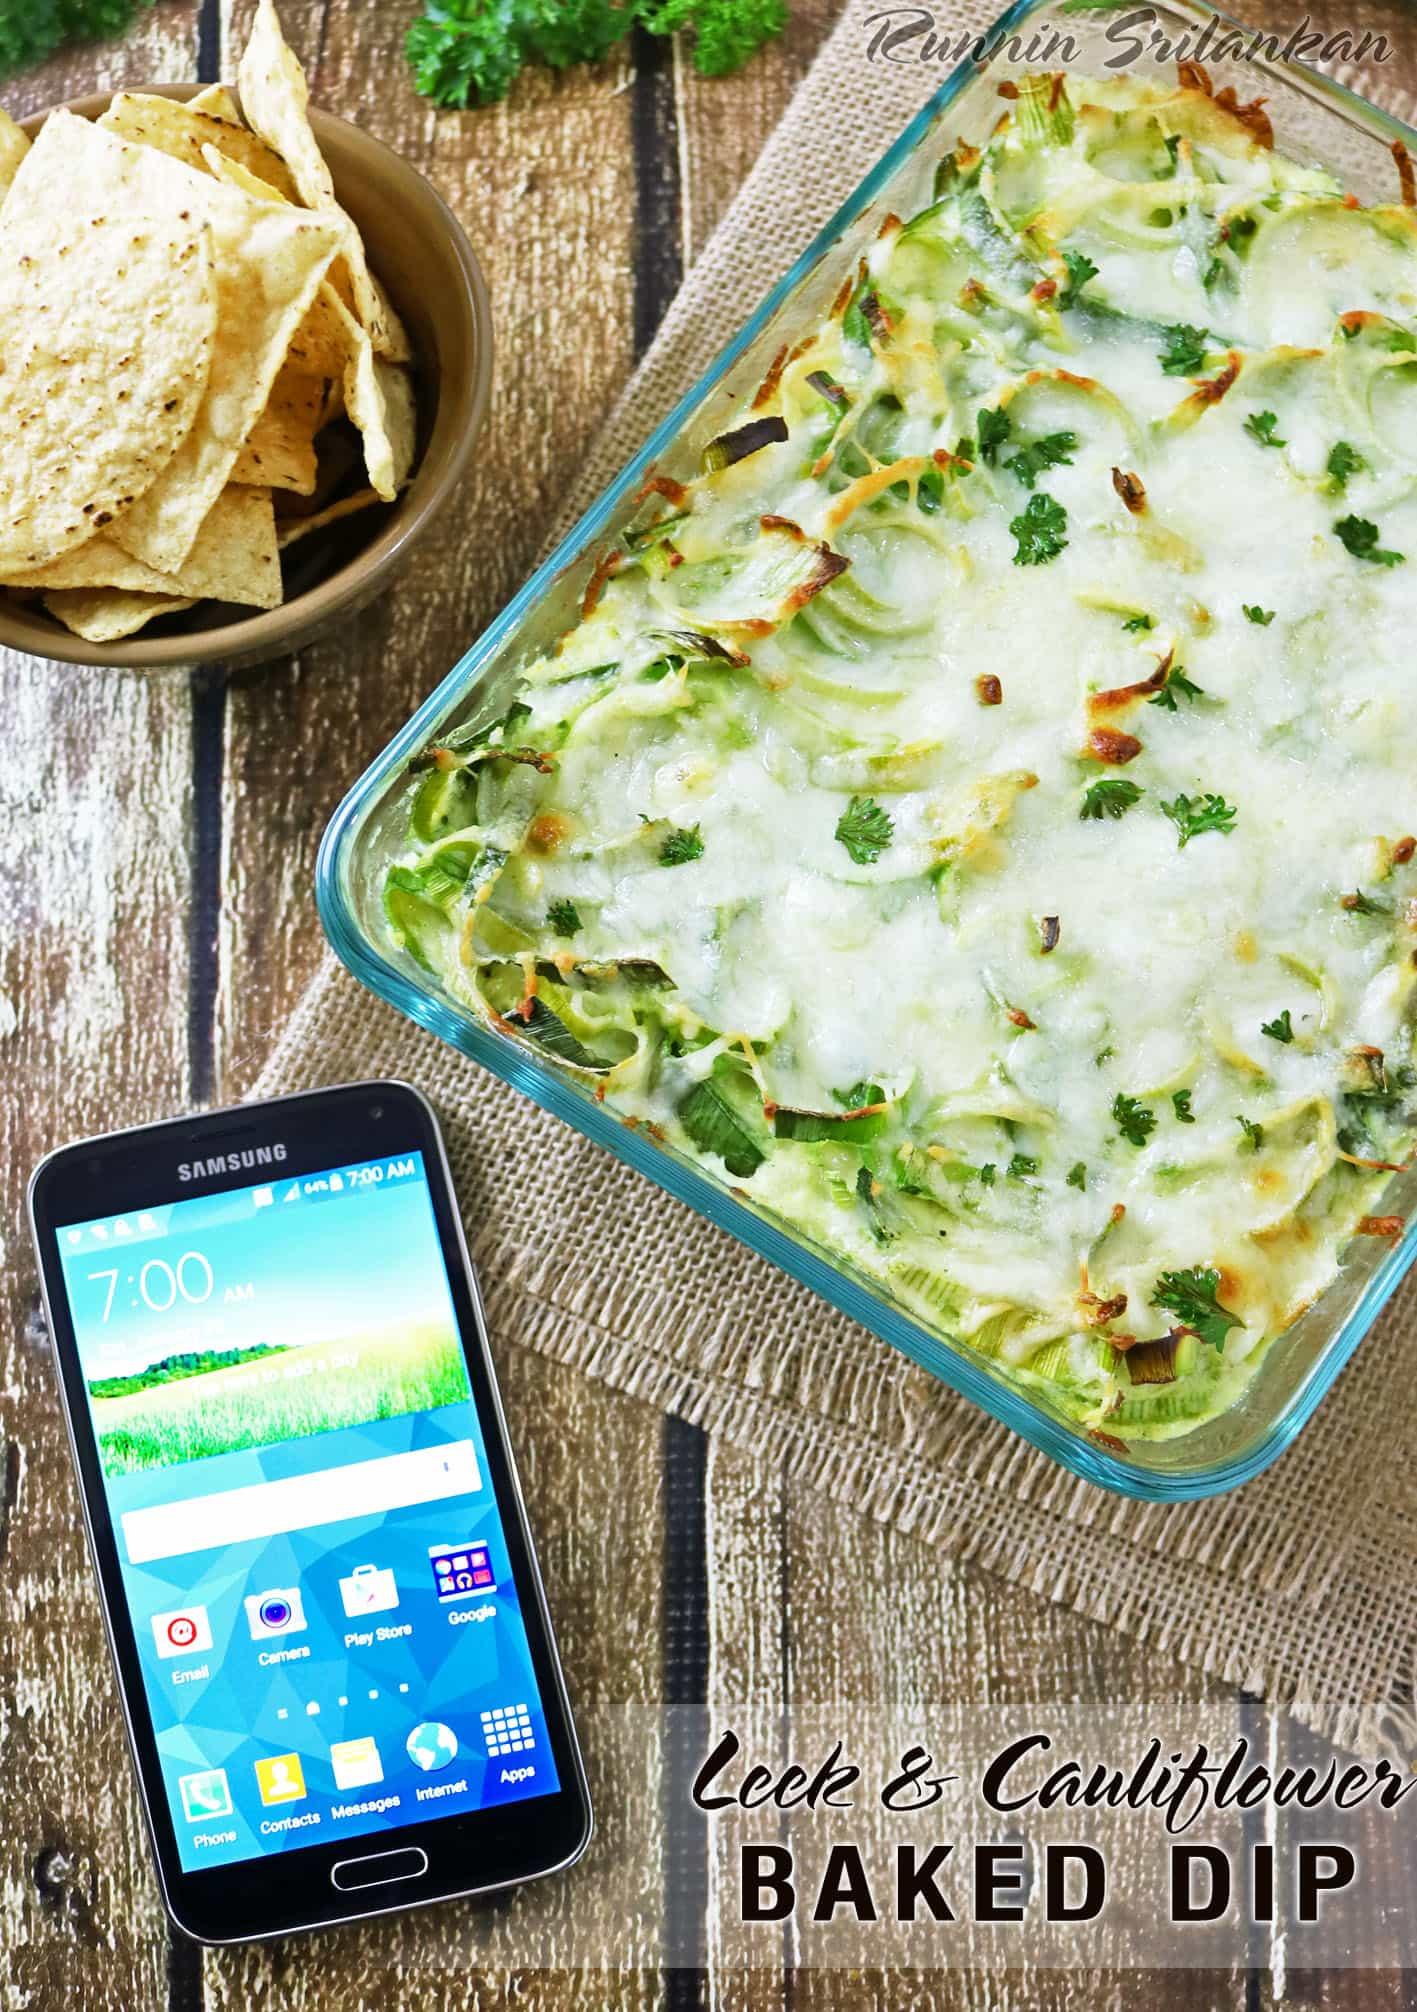 Leek Cauliflower Baked Dip perfect for #DataAndAMovie